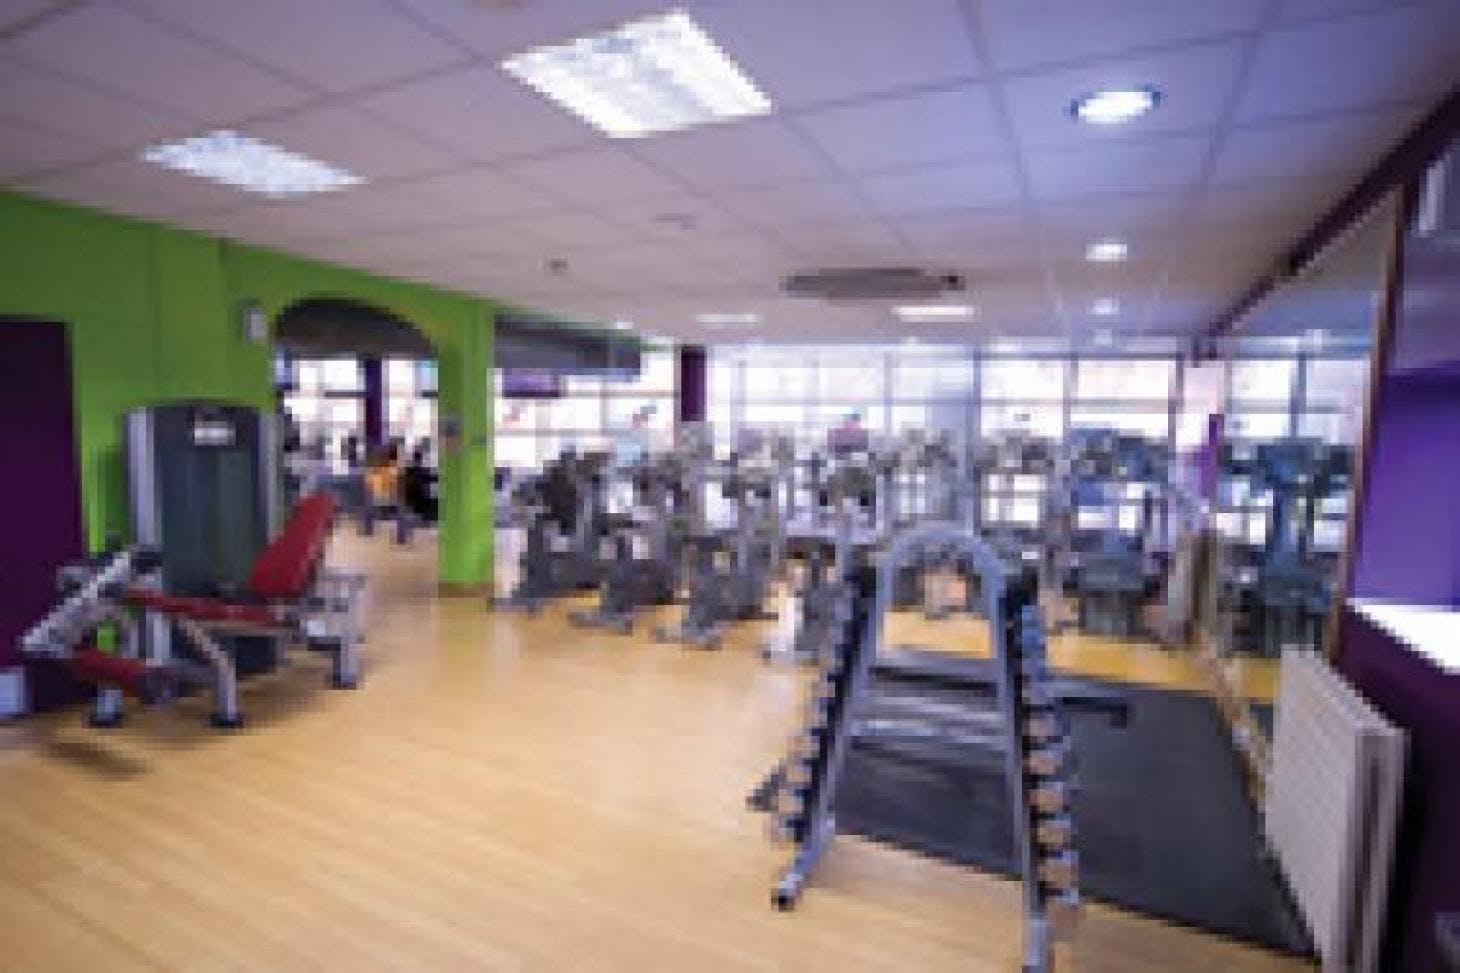 Archway Leisure Centre Gym gym